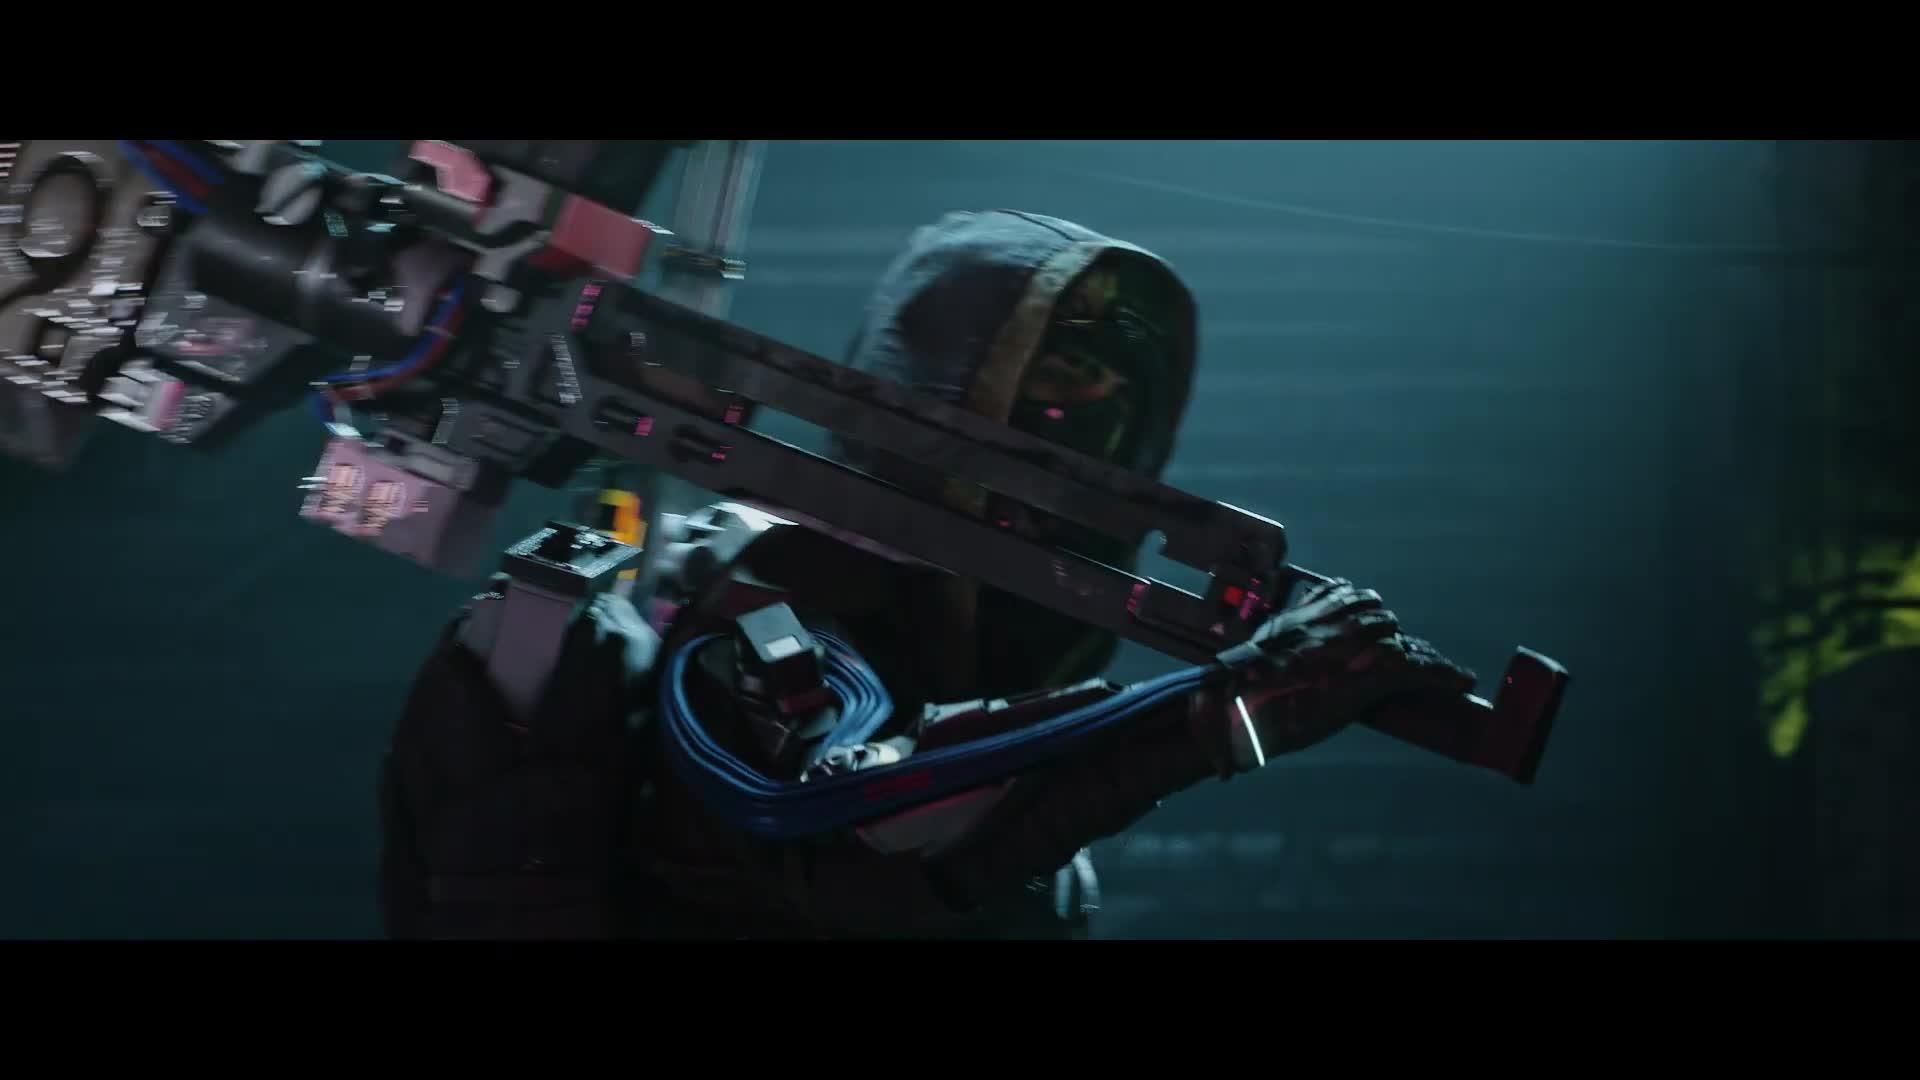 Trailer, E3, actionspiel, E3 2019, Focus Interactive, The Surge, The Surge 2